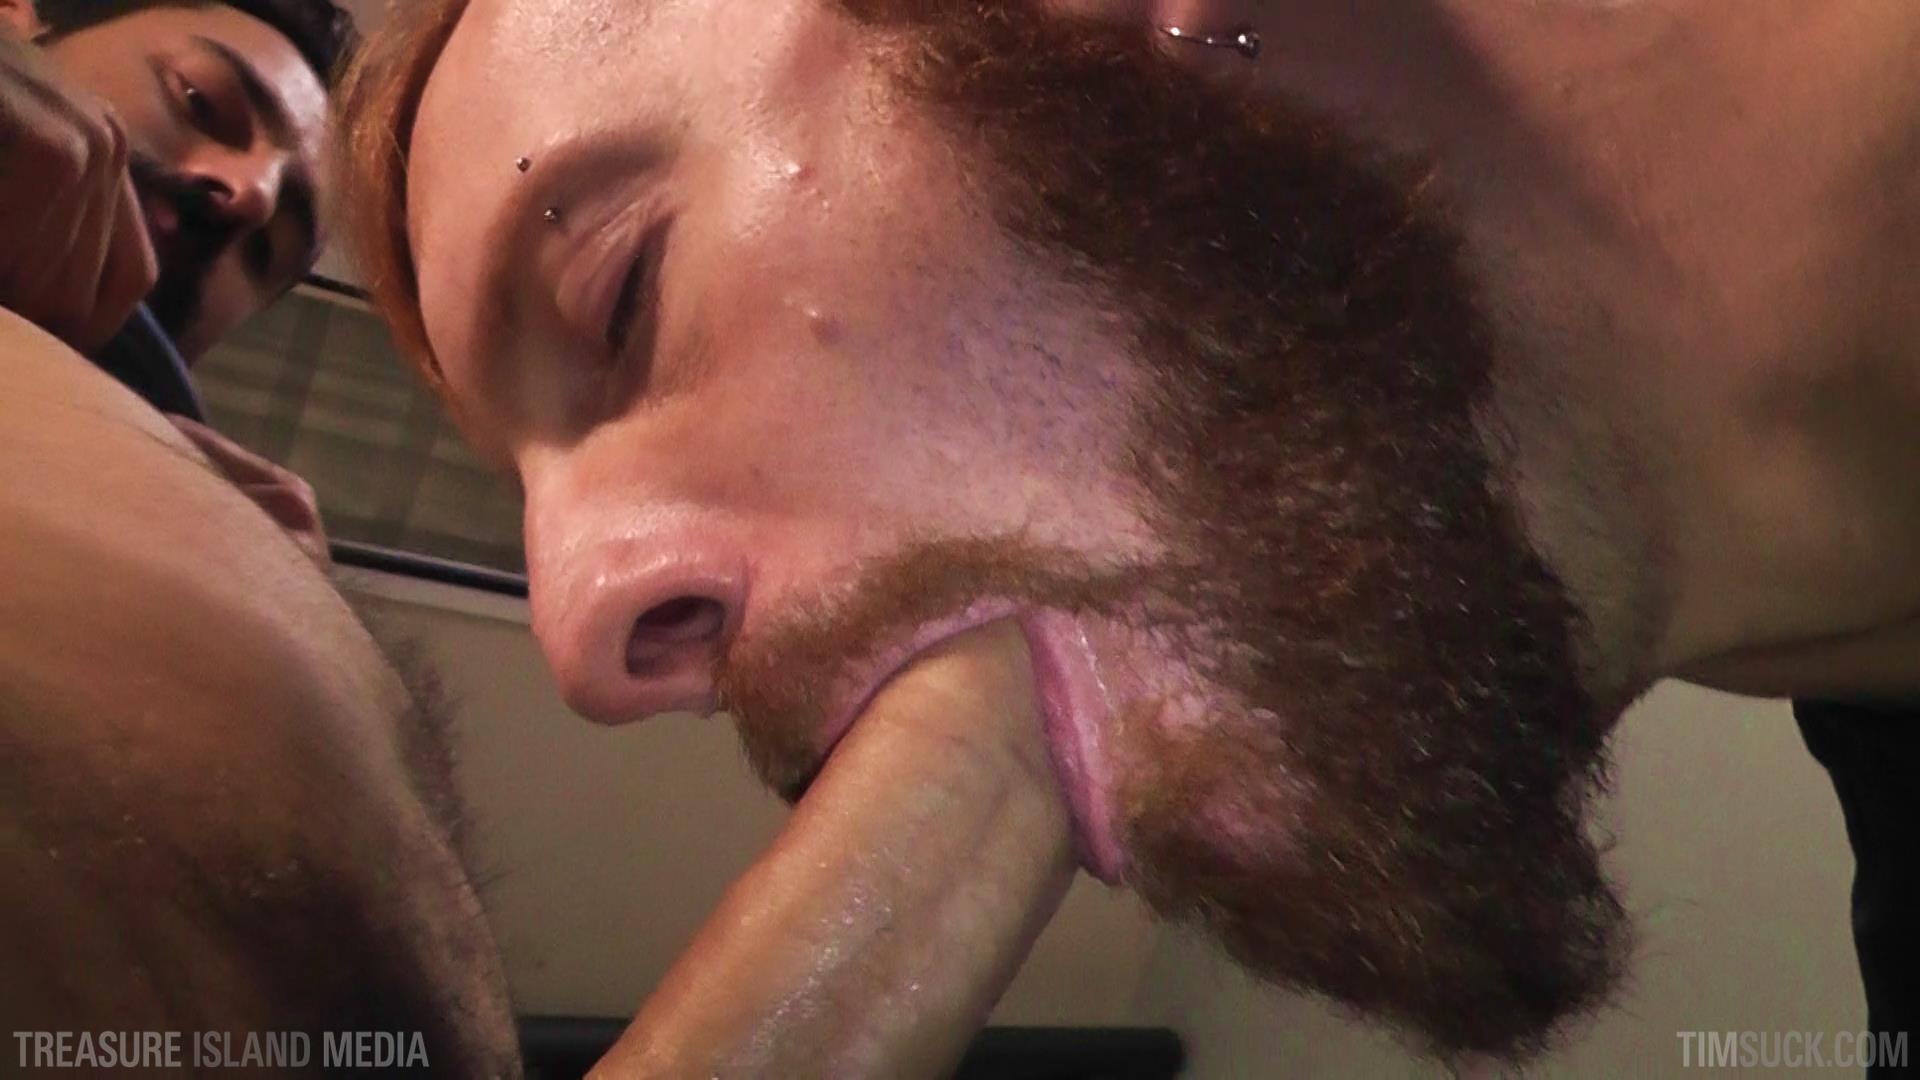 Pov blowjob familiar beauty loves the foreskin - 3 part 1